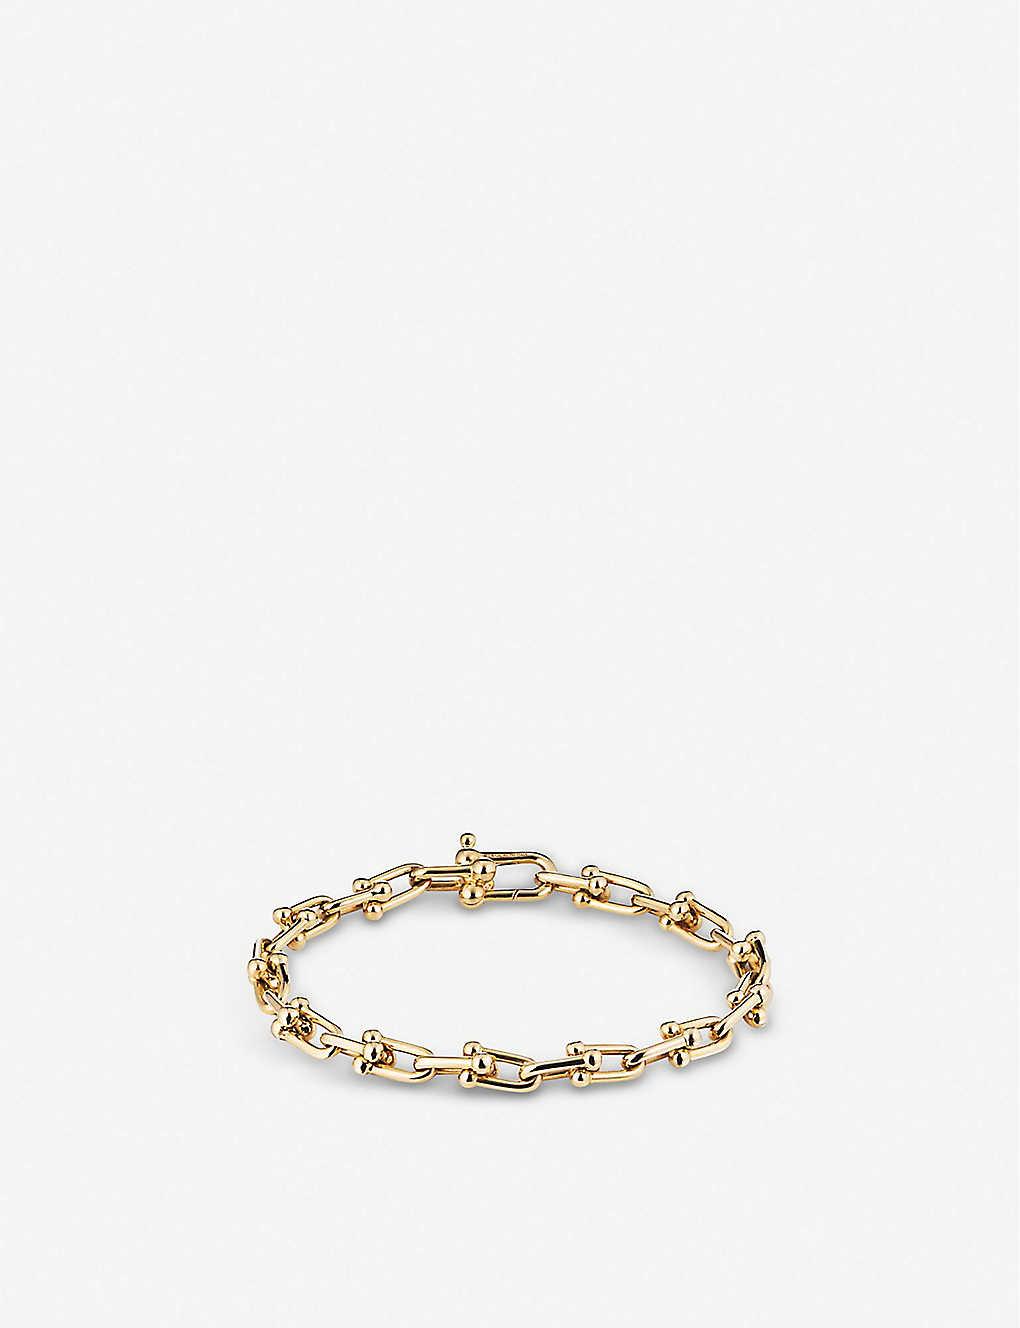 TIFFANY & CO - Tiffany City HardWear 18ct gold link bracelet